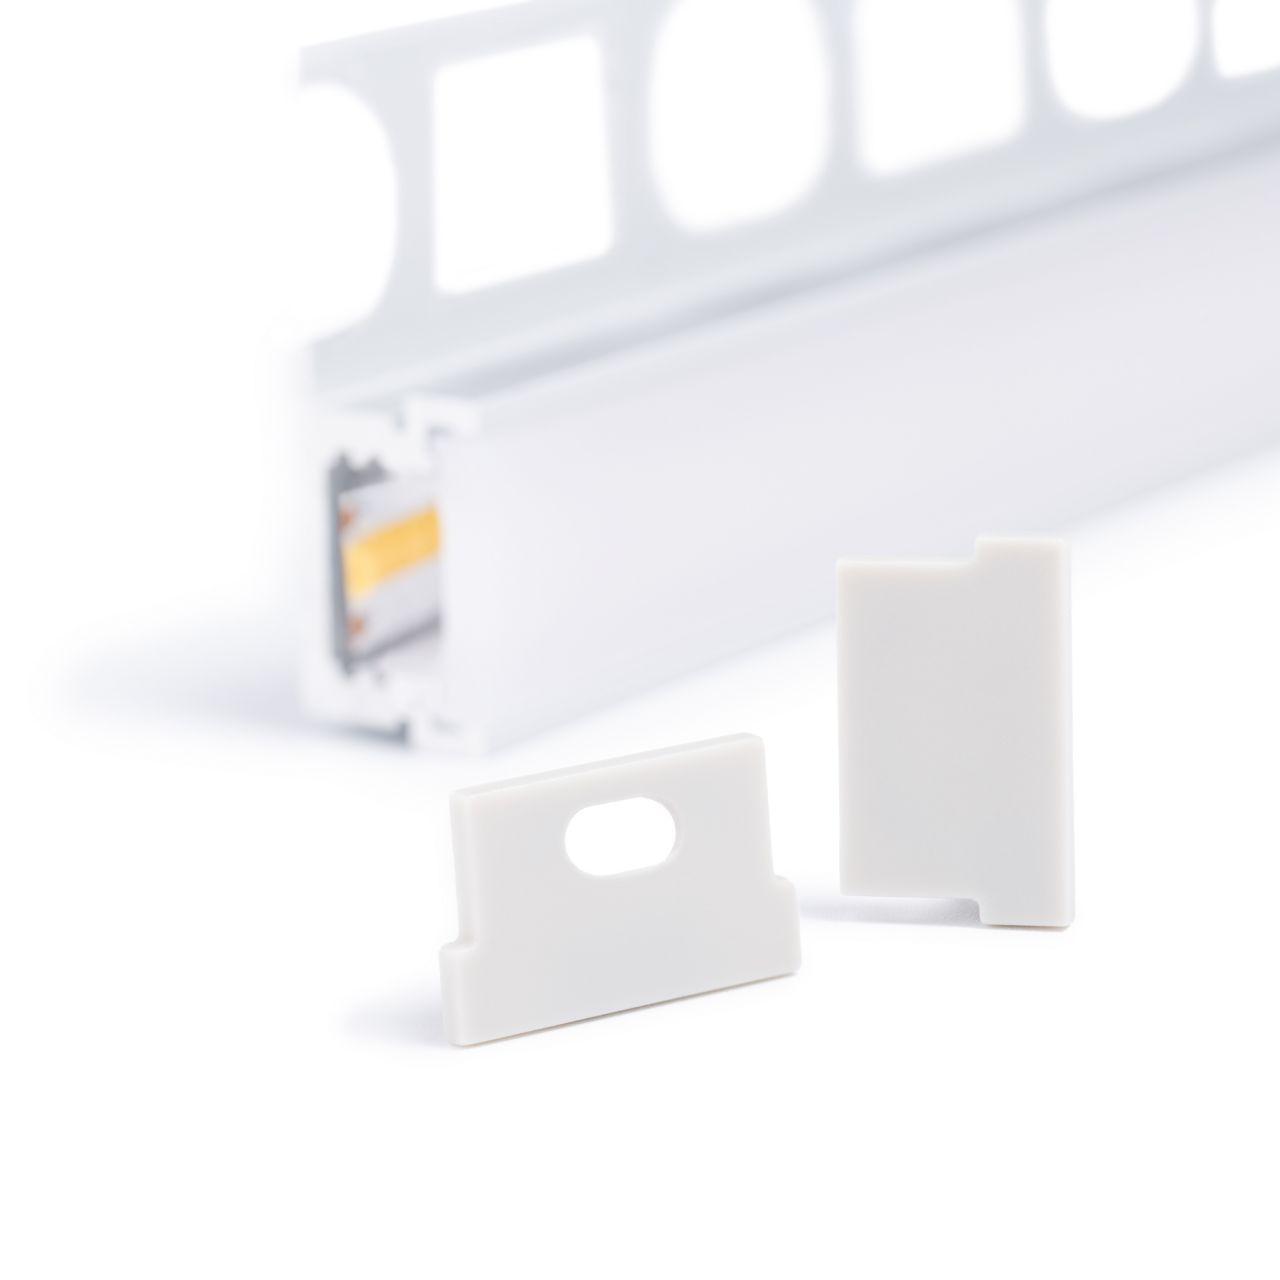 Endkappe für Aluminium LED Profil CC-80